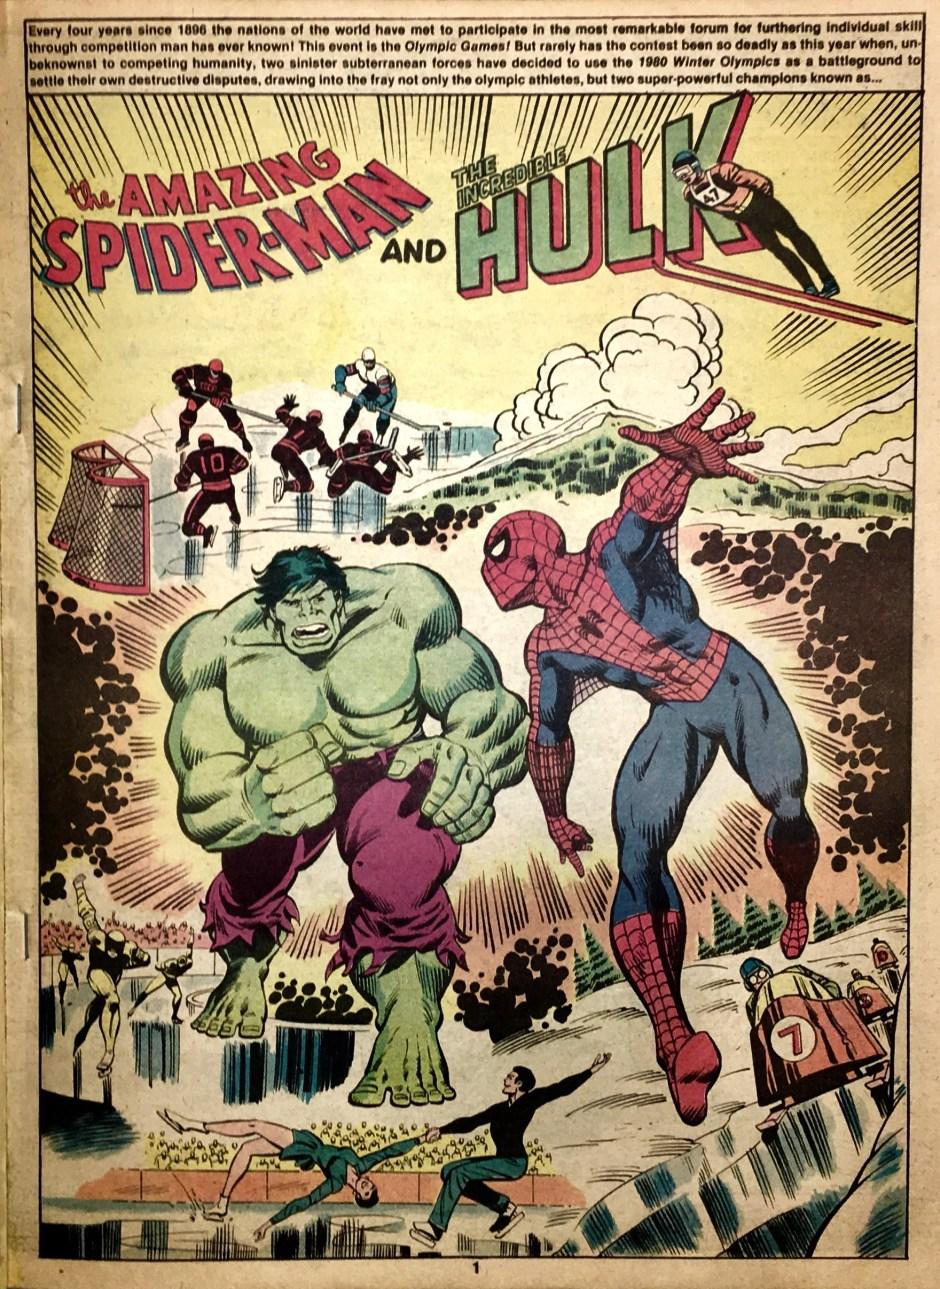 Spiderman vs Hulk at the Winter Olympics_2